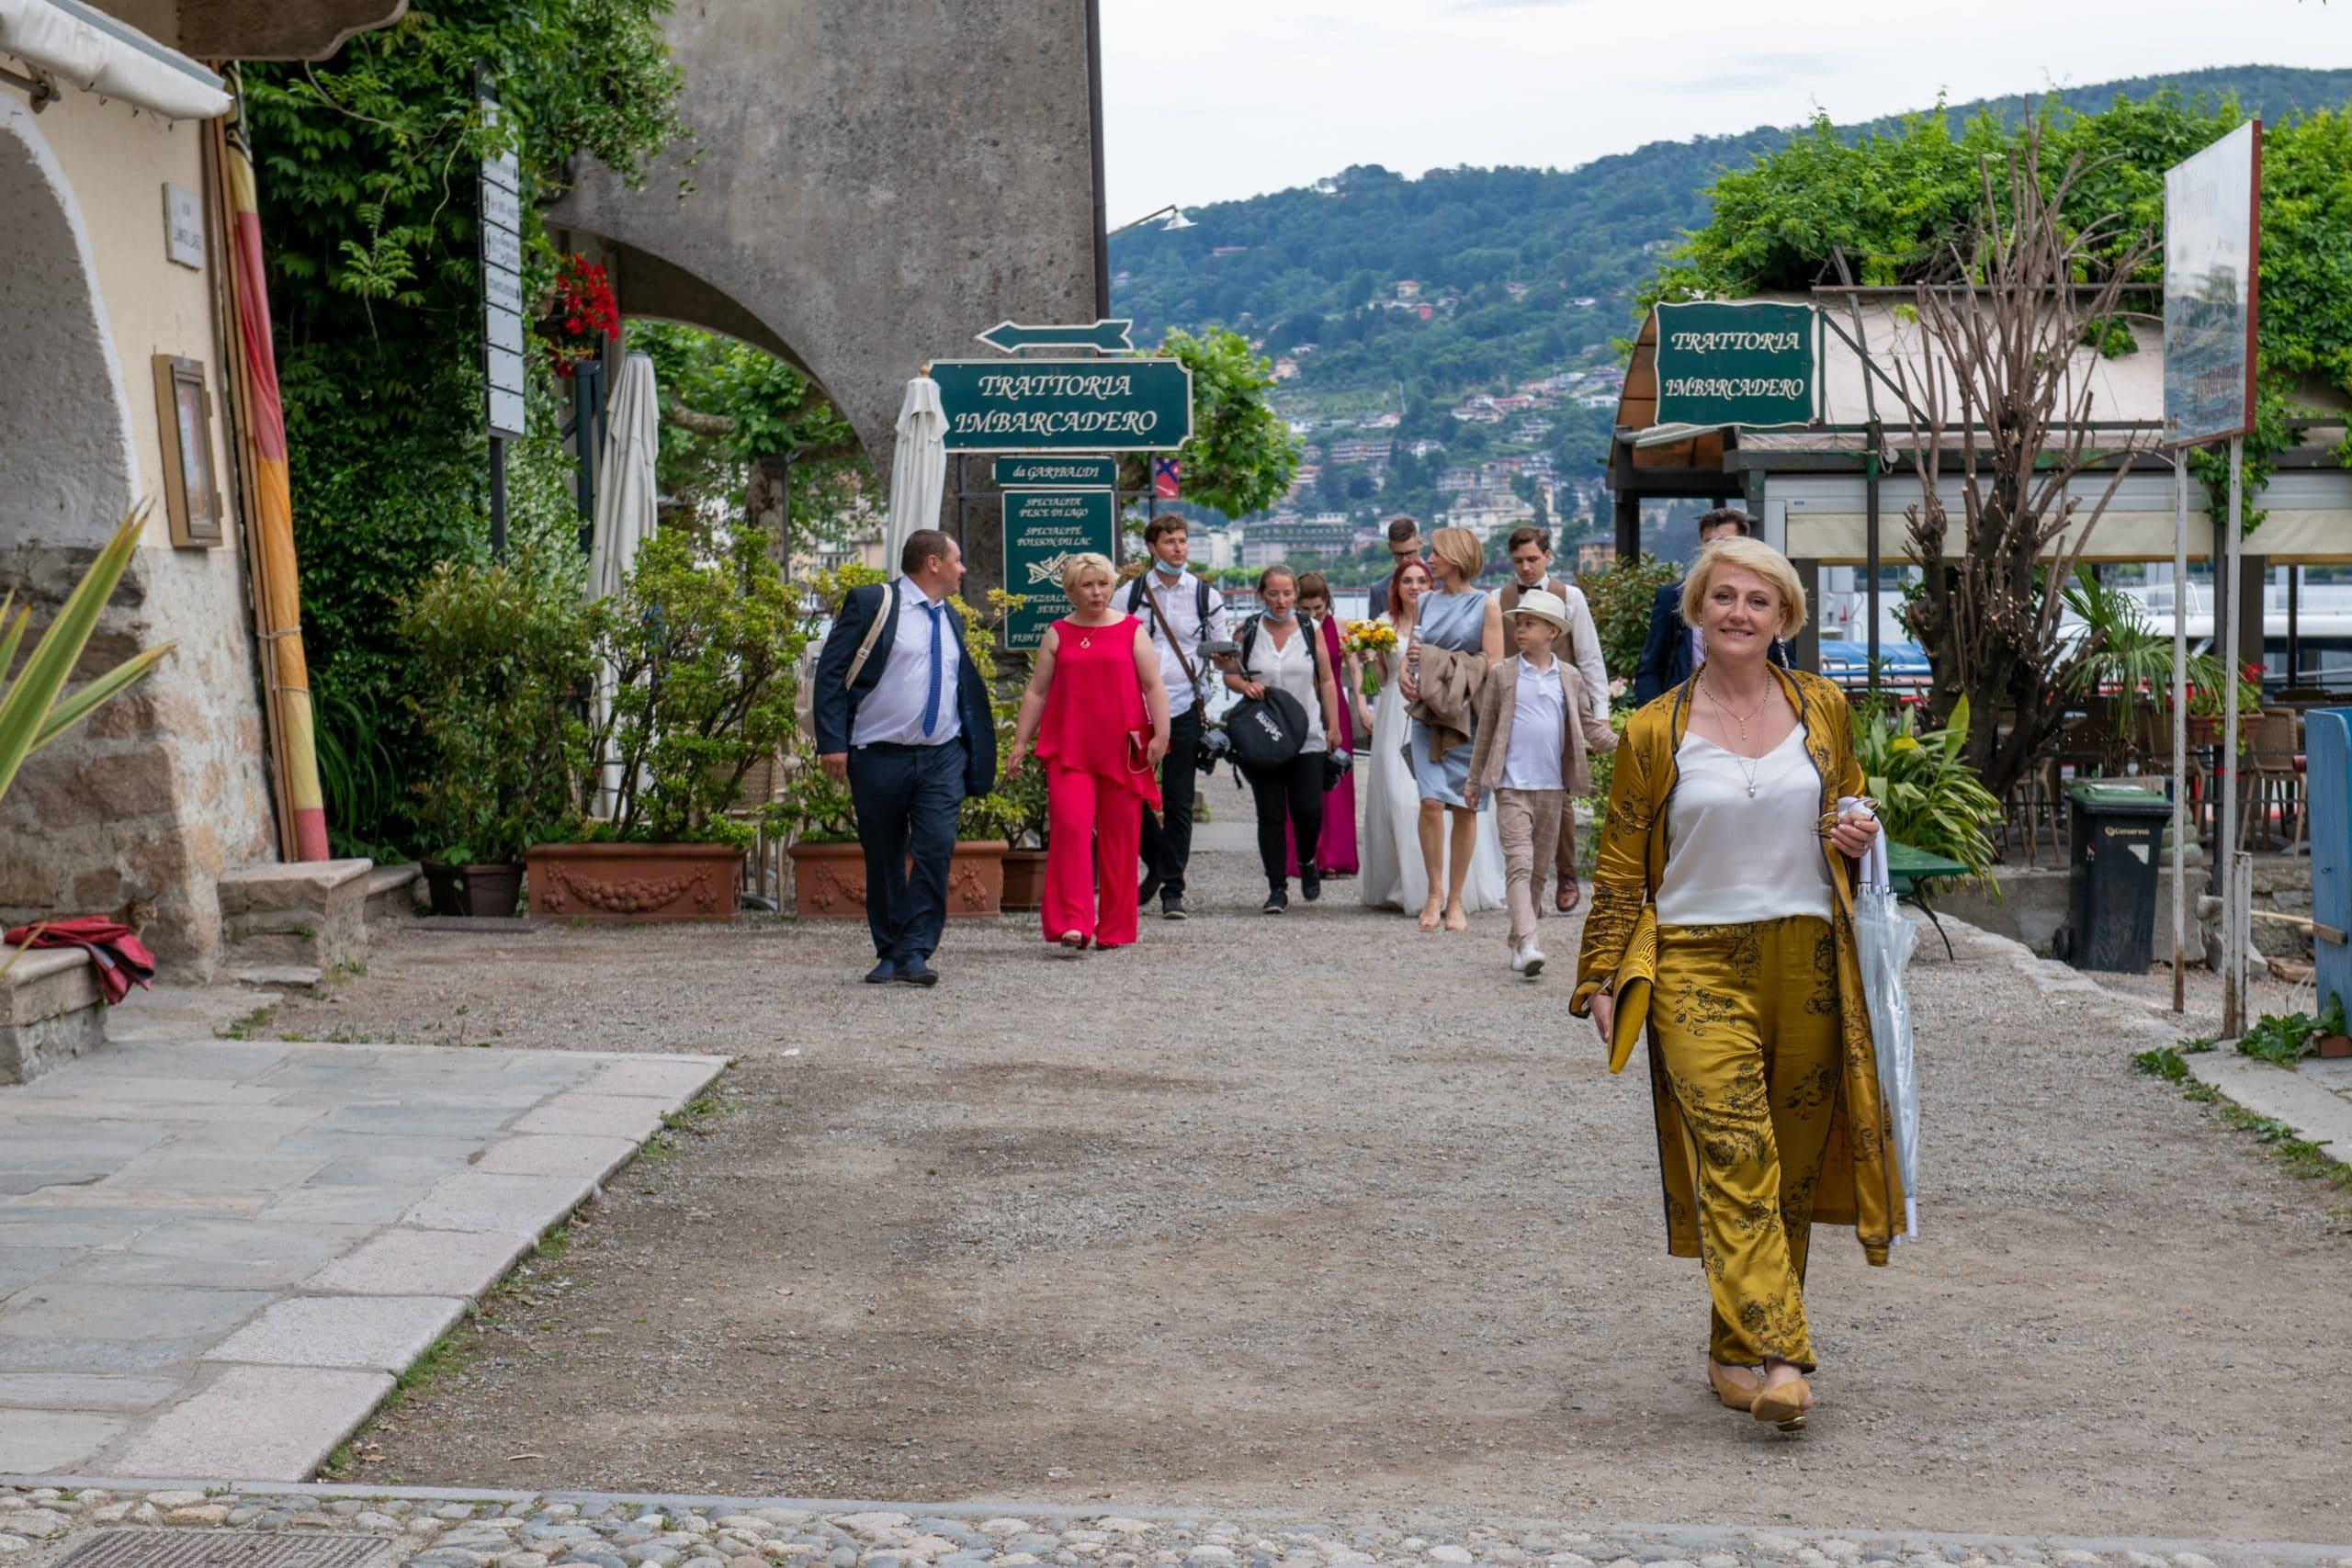 Vilma Wedding & Event Planner _ Vilma Rapšaitė _ vestuvės užsienyje _ santuoka Italijoje _ Lago Maggiore _ vestuvių planavimas Italijoje _ santuokos organizatorė _ šiaurės Italija